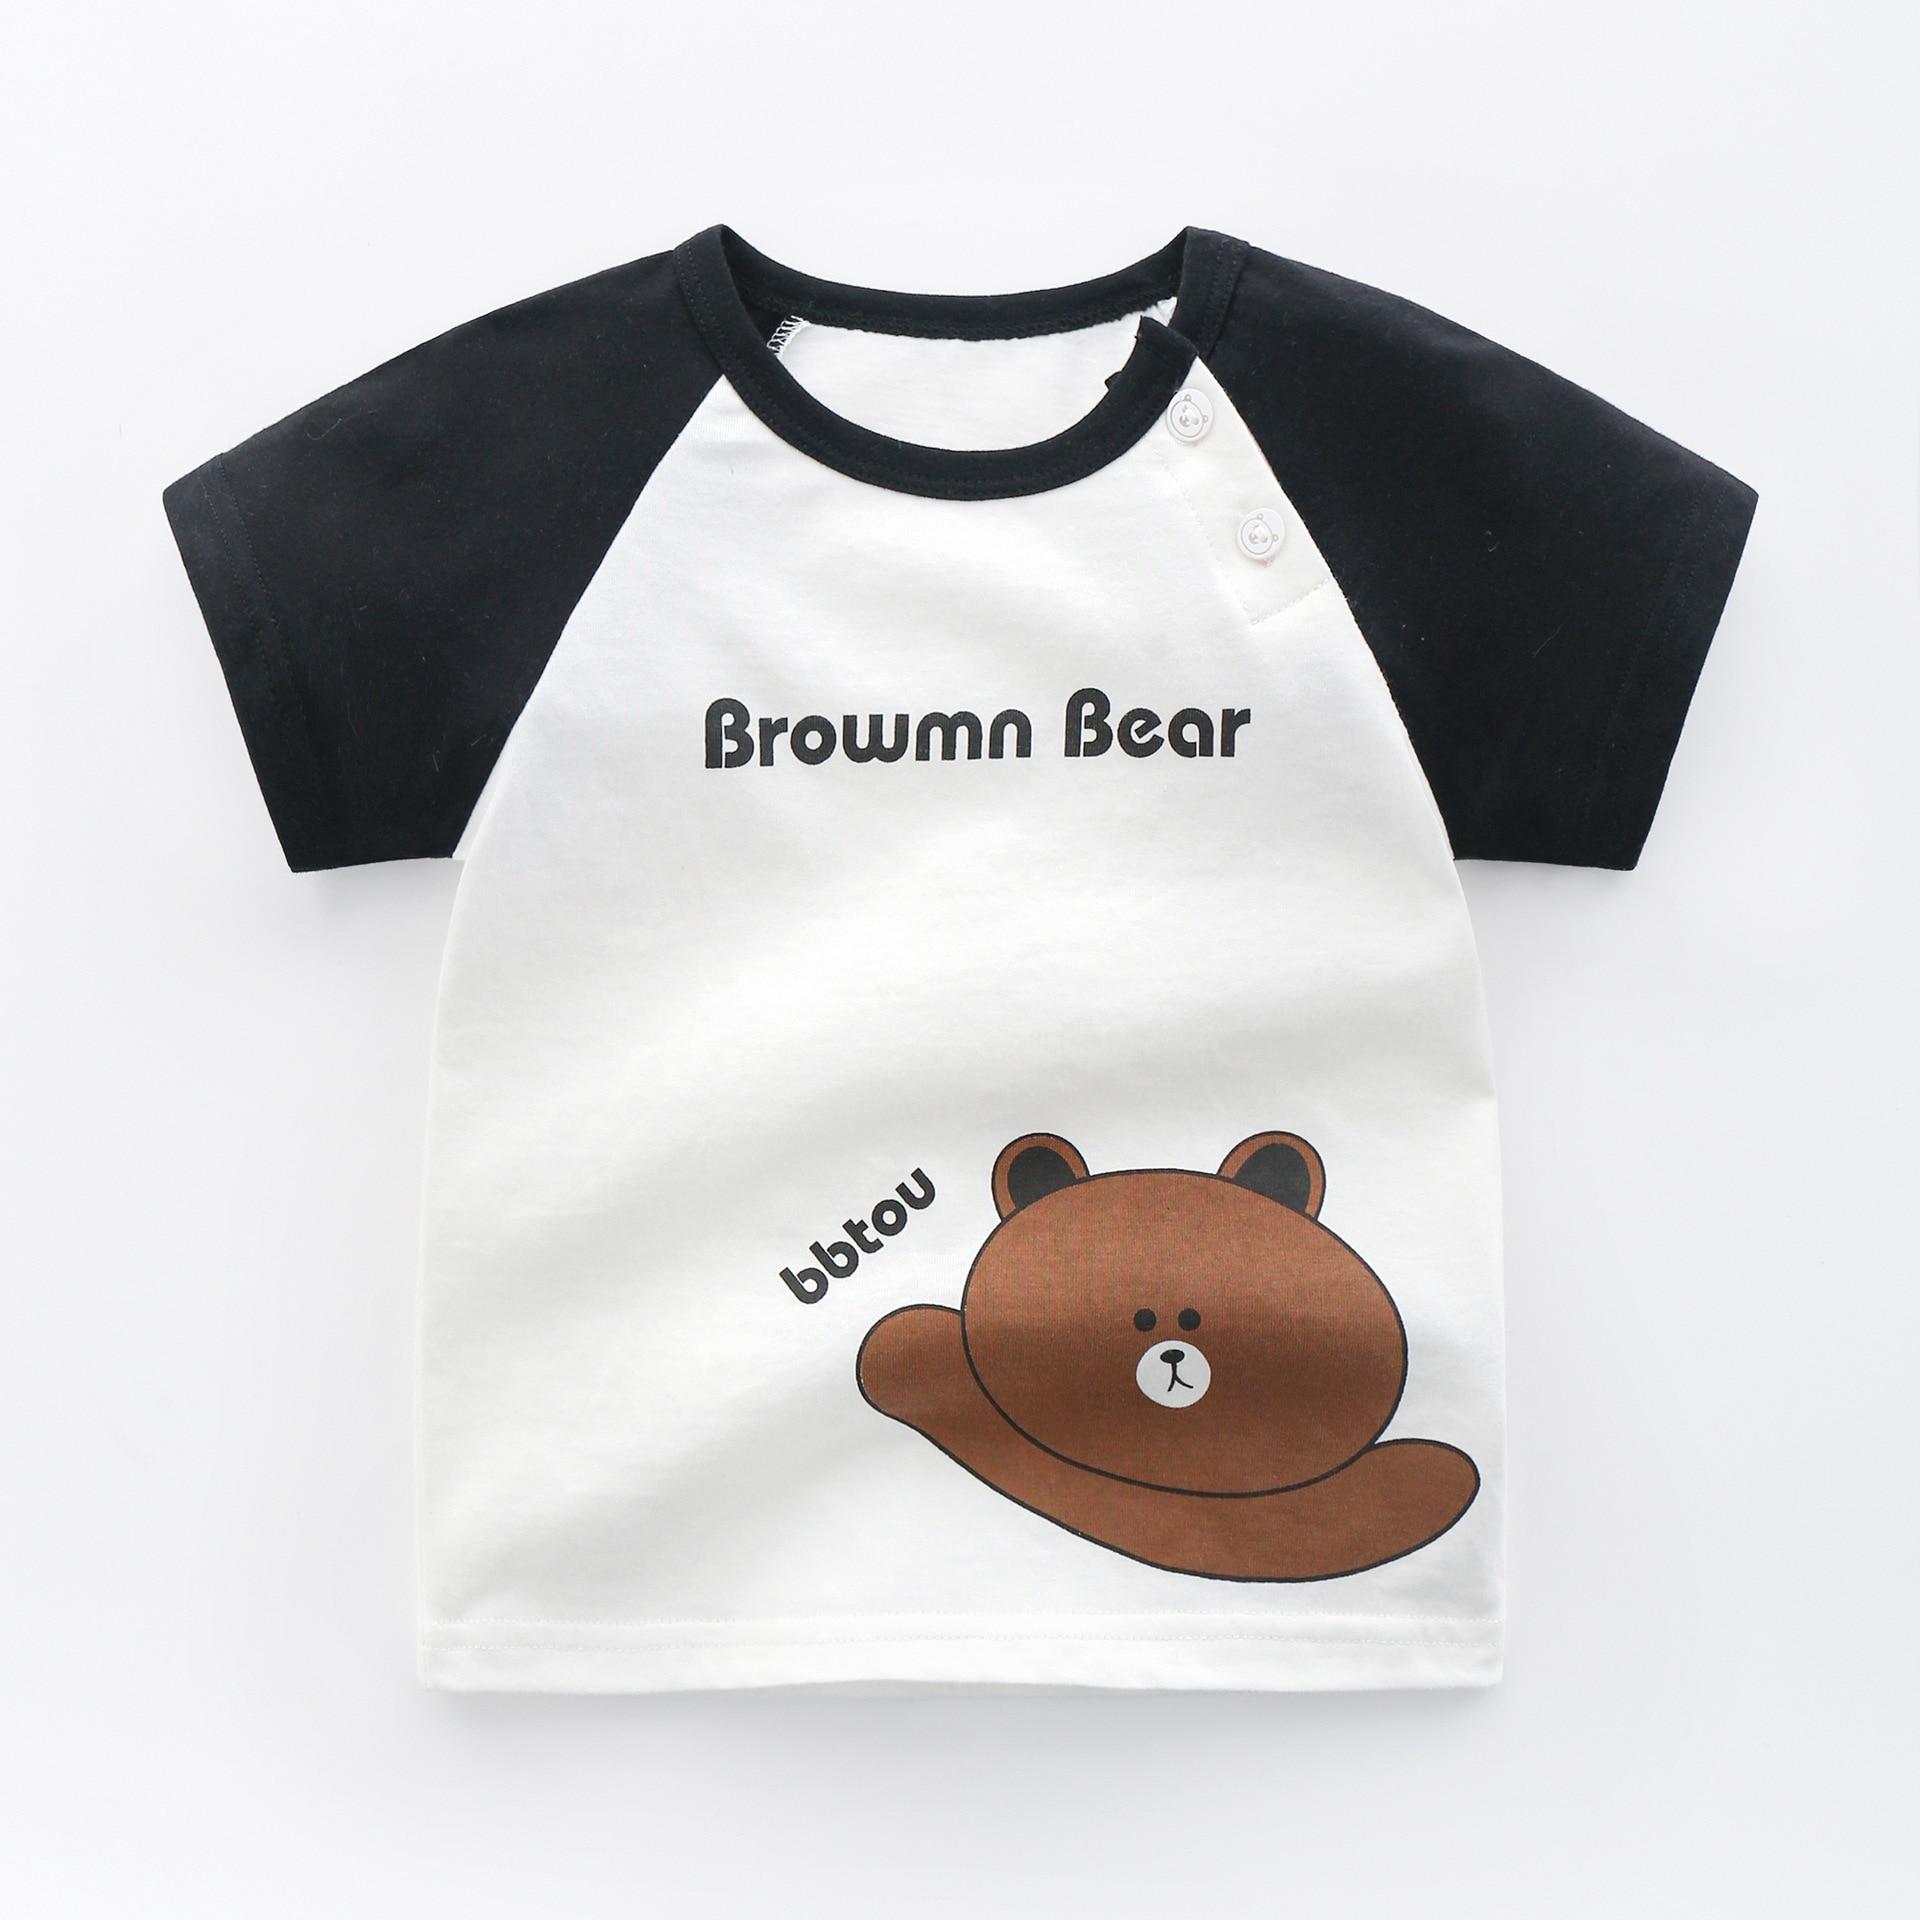 Summer Children's Wear Baby Kids T Shirts Girls Boys Clothes Tshirt Cotton Cartoon Printing Tops T-shirt Children Clothing-4